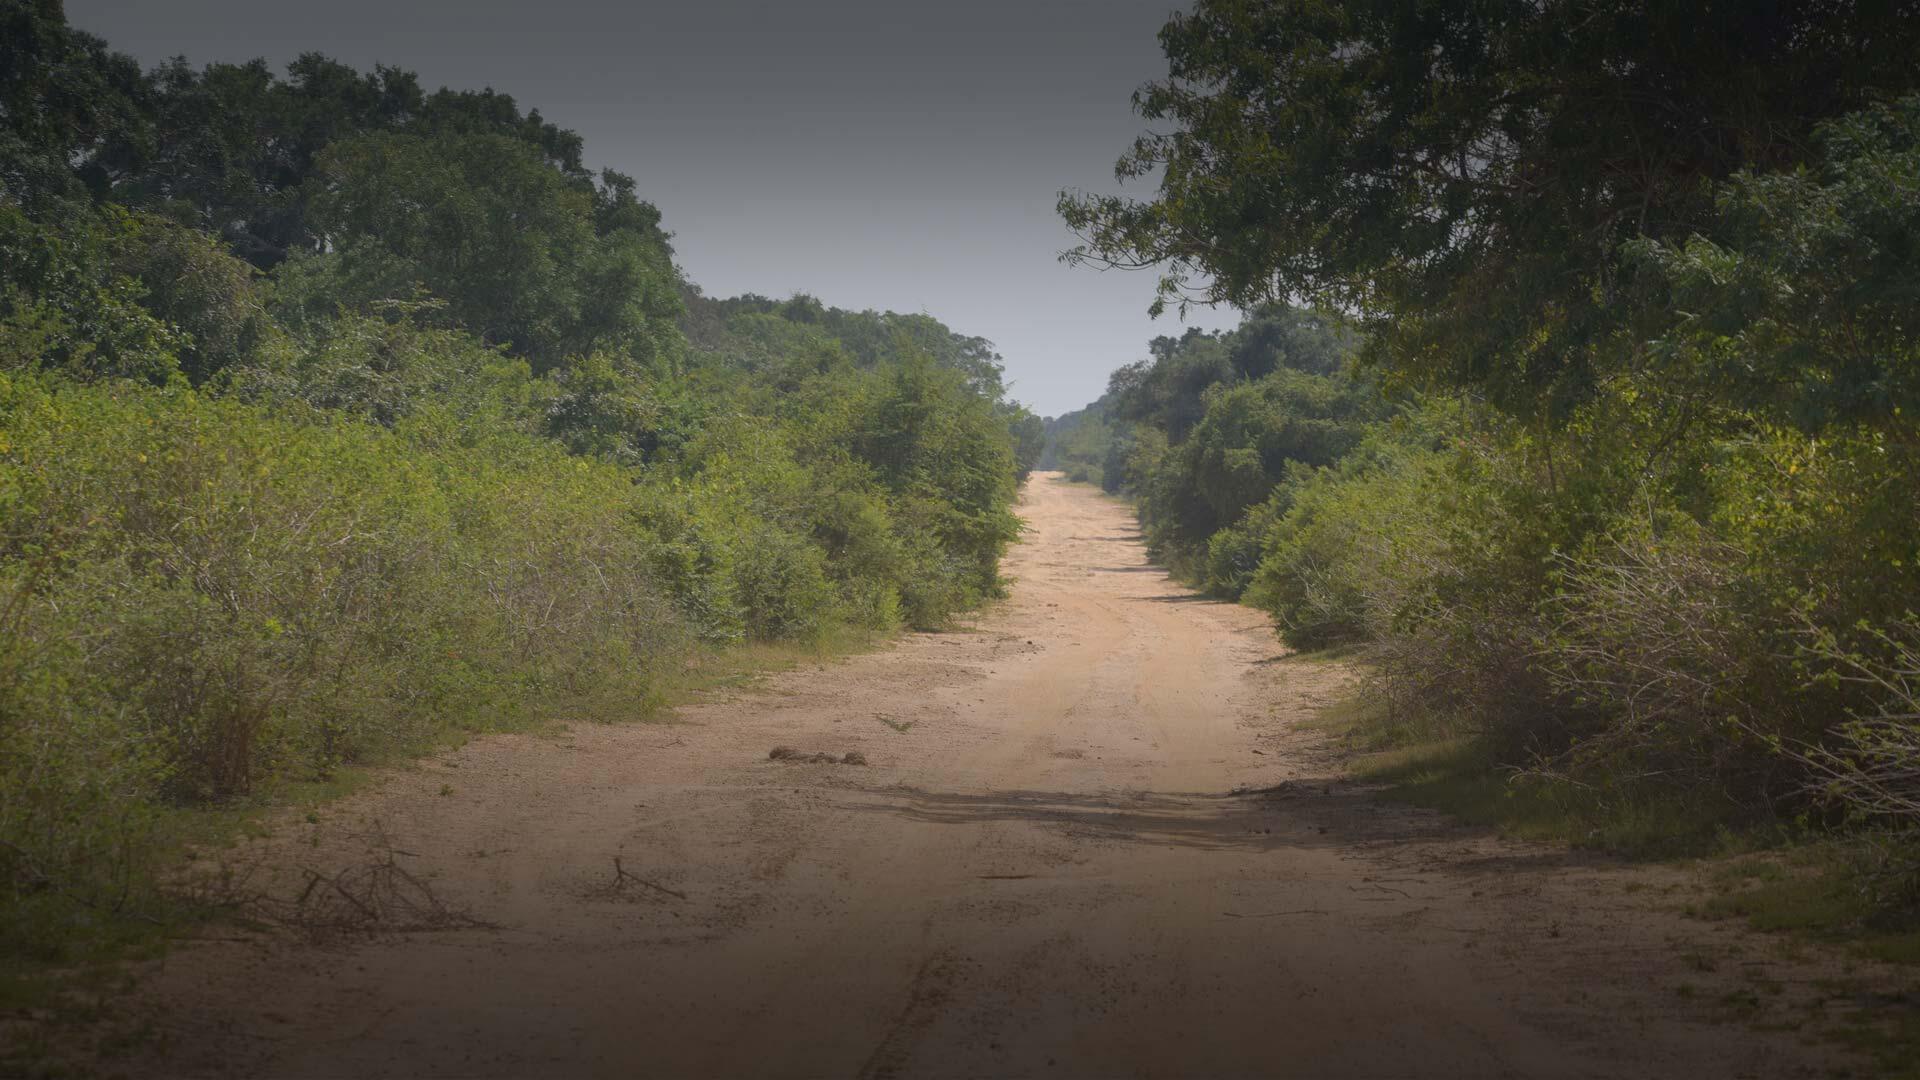 Wilpattu Road